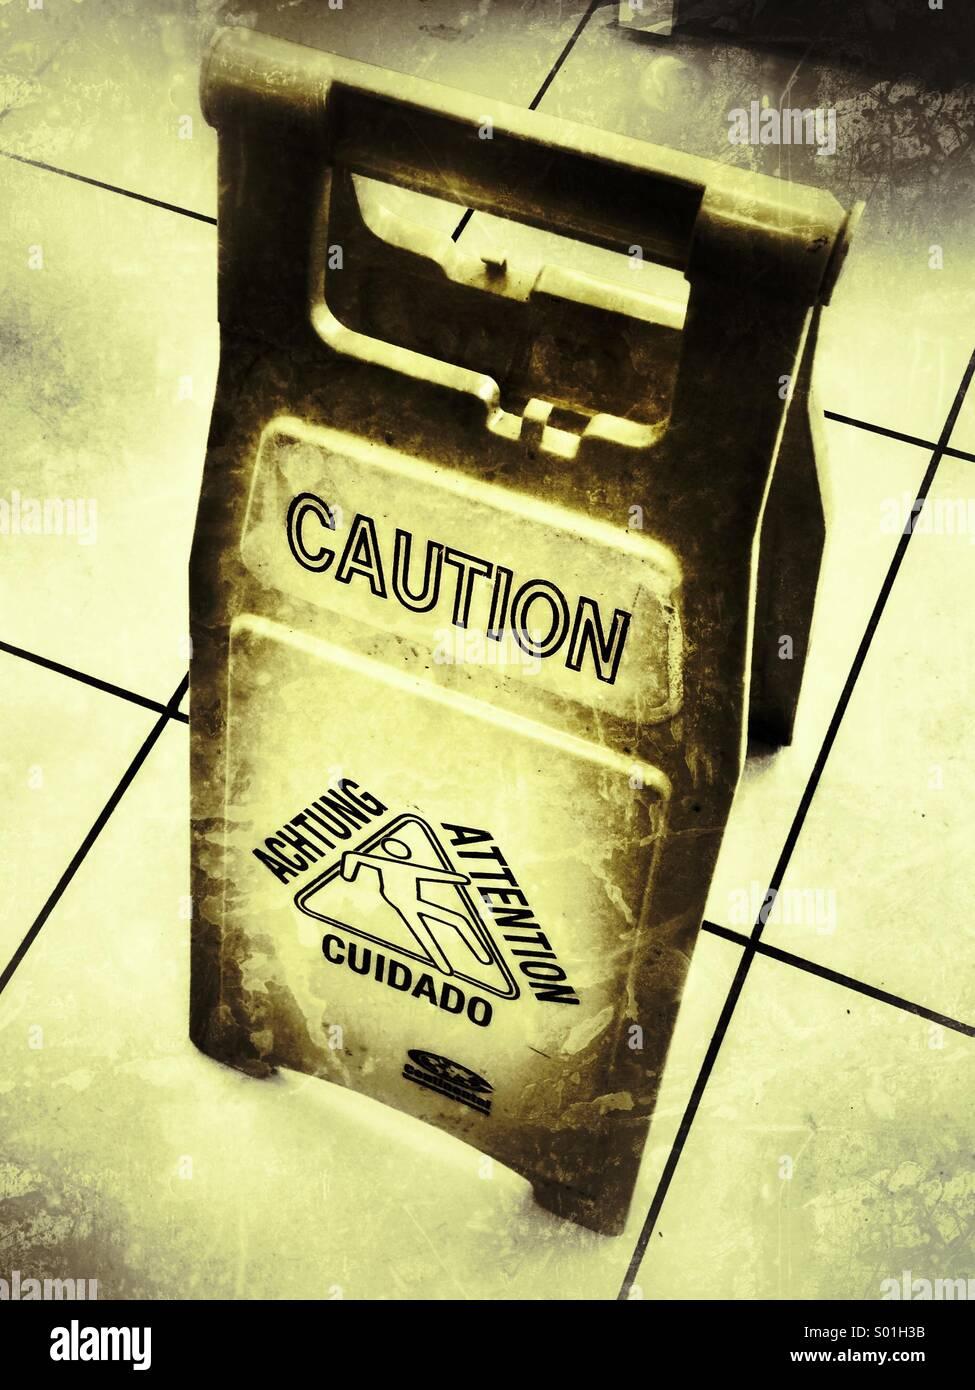 A wet floor warning - Stock Image